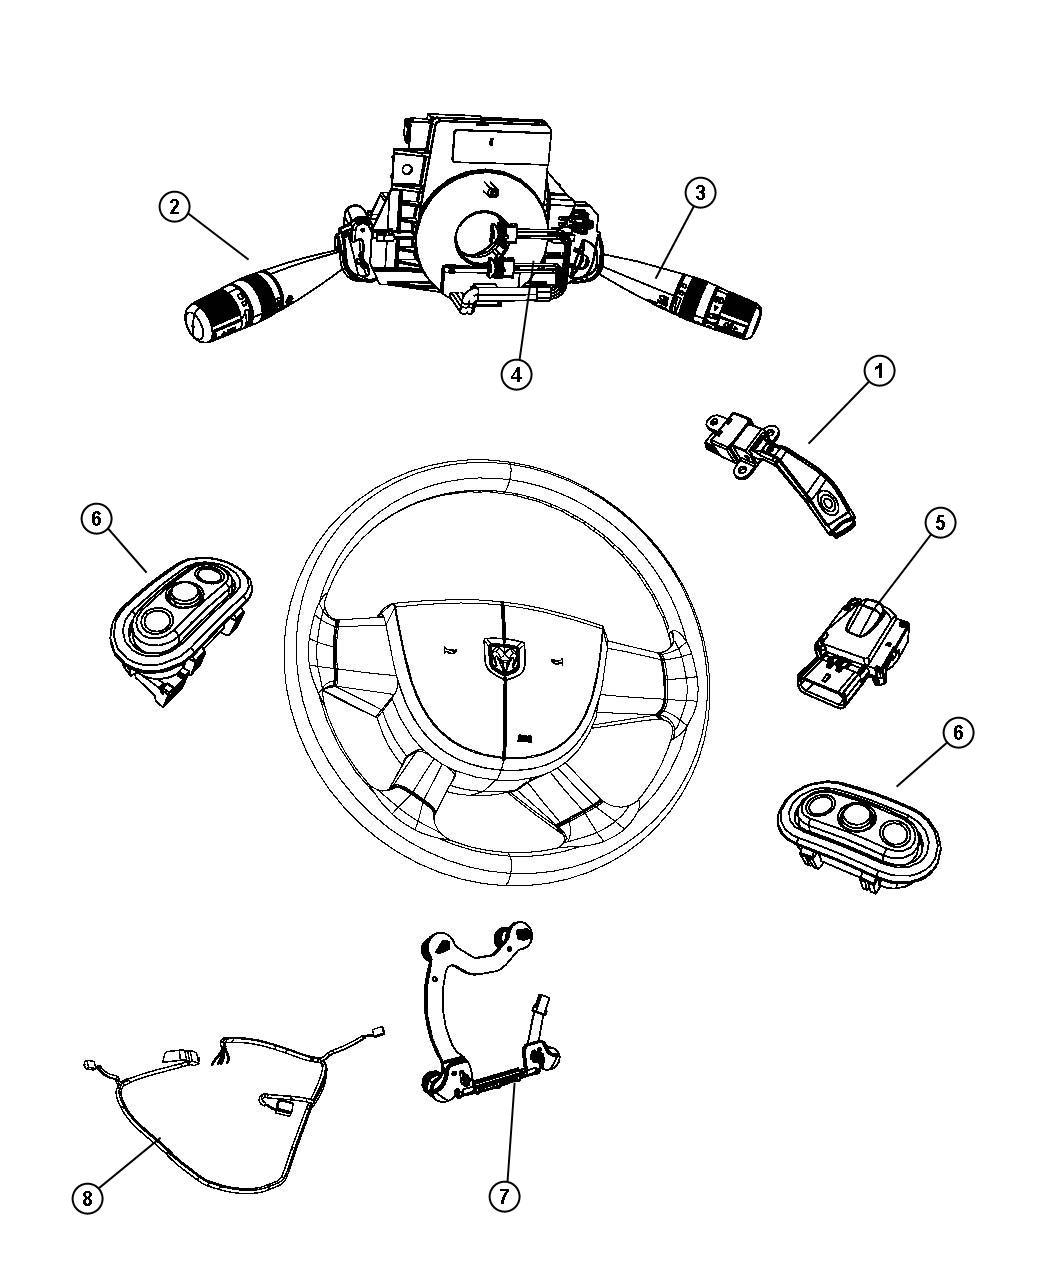 2008 Dodge Avenger Switch. Ignition. Instrument, panel